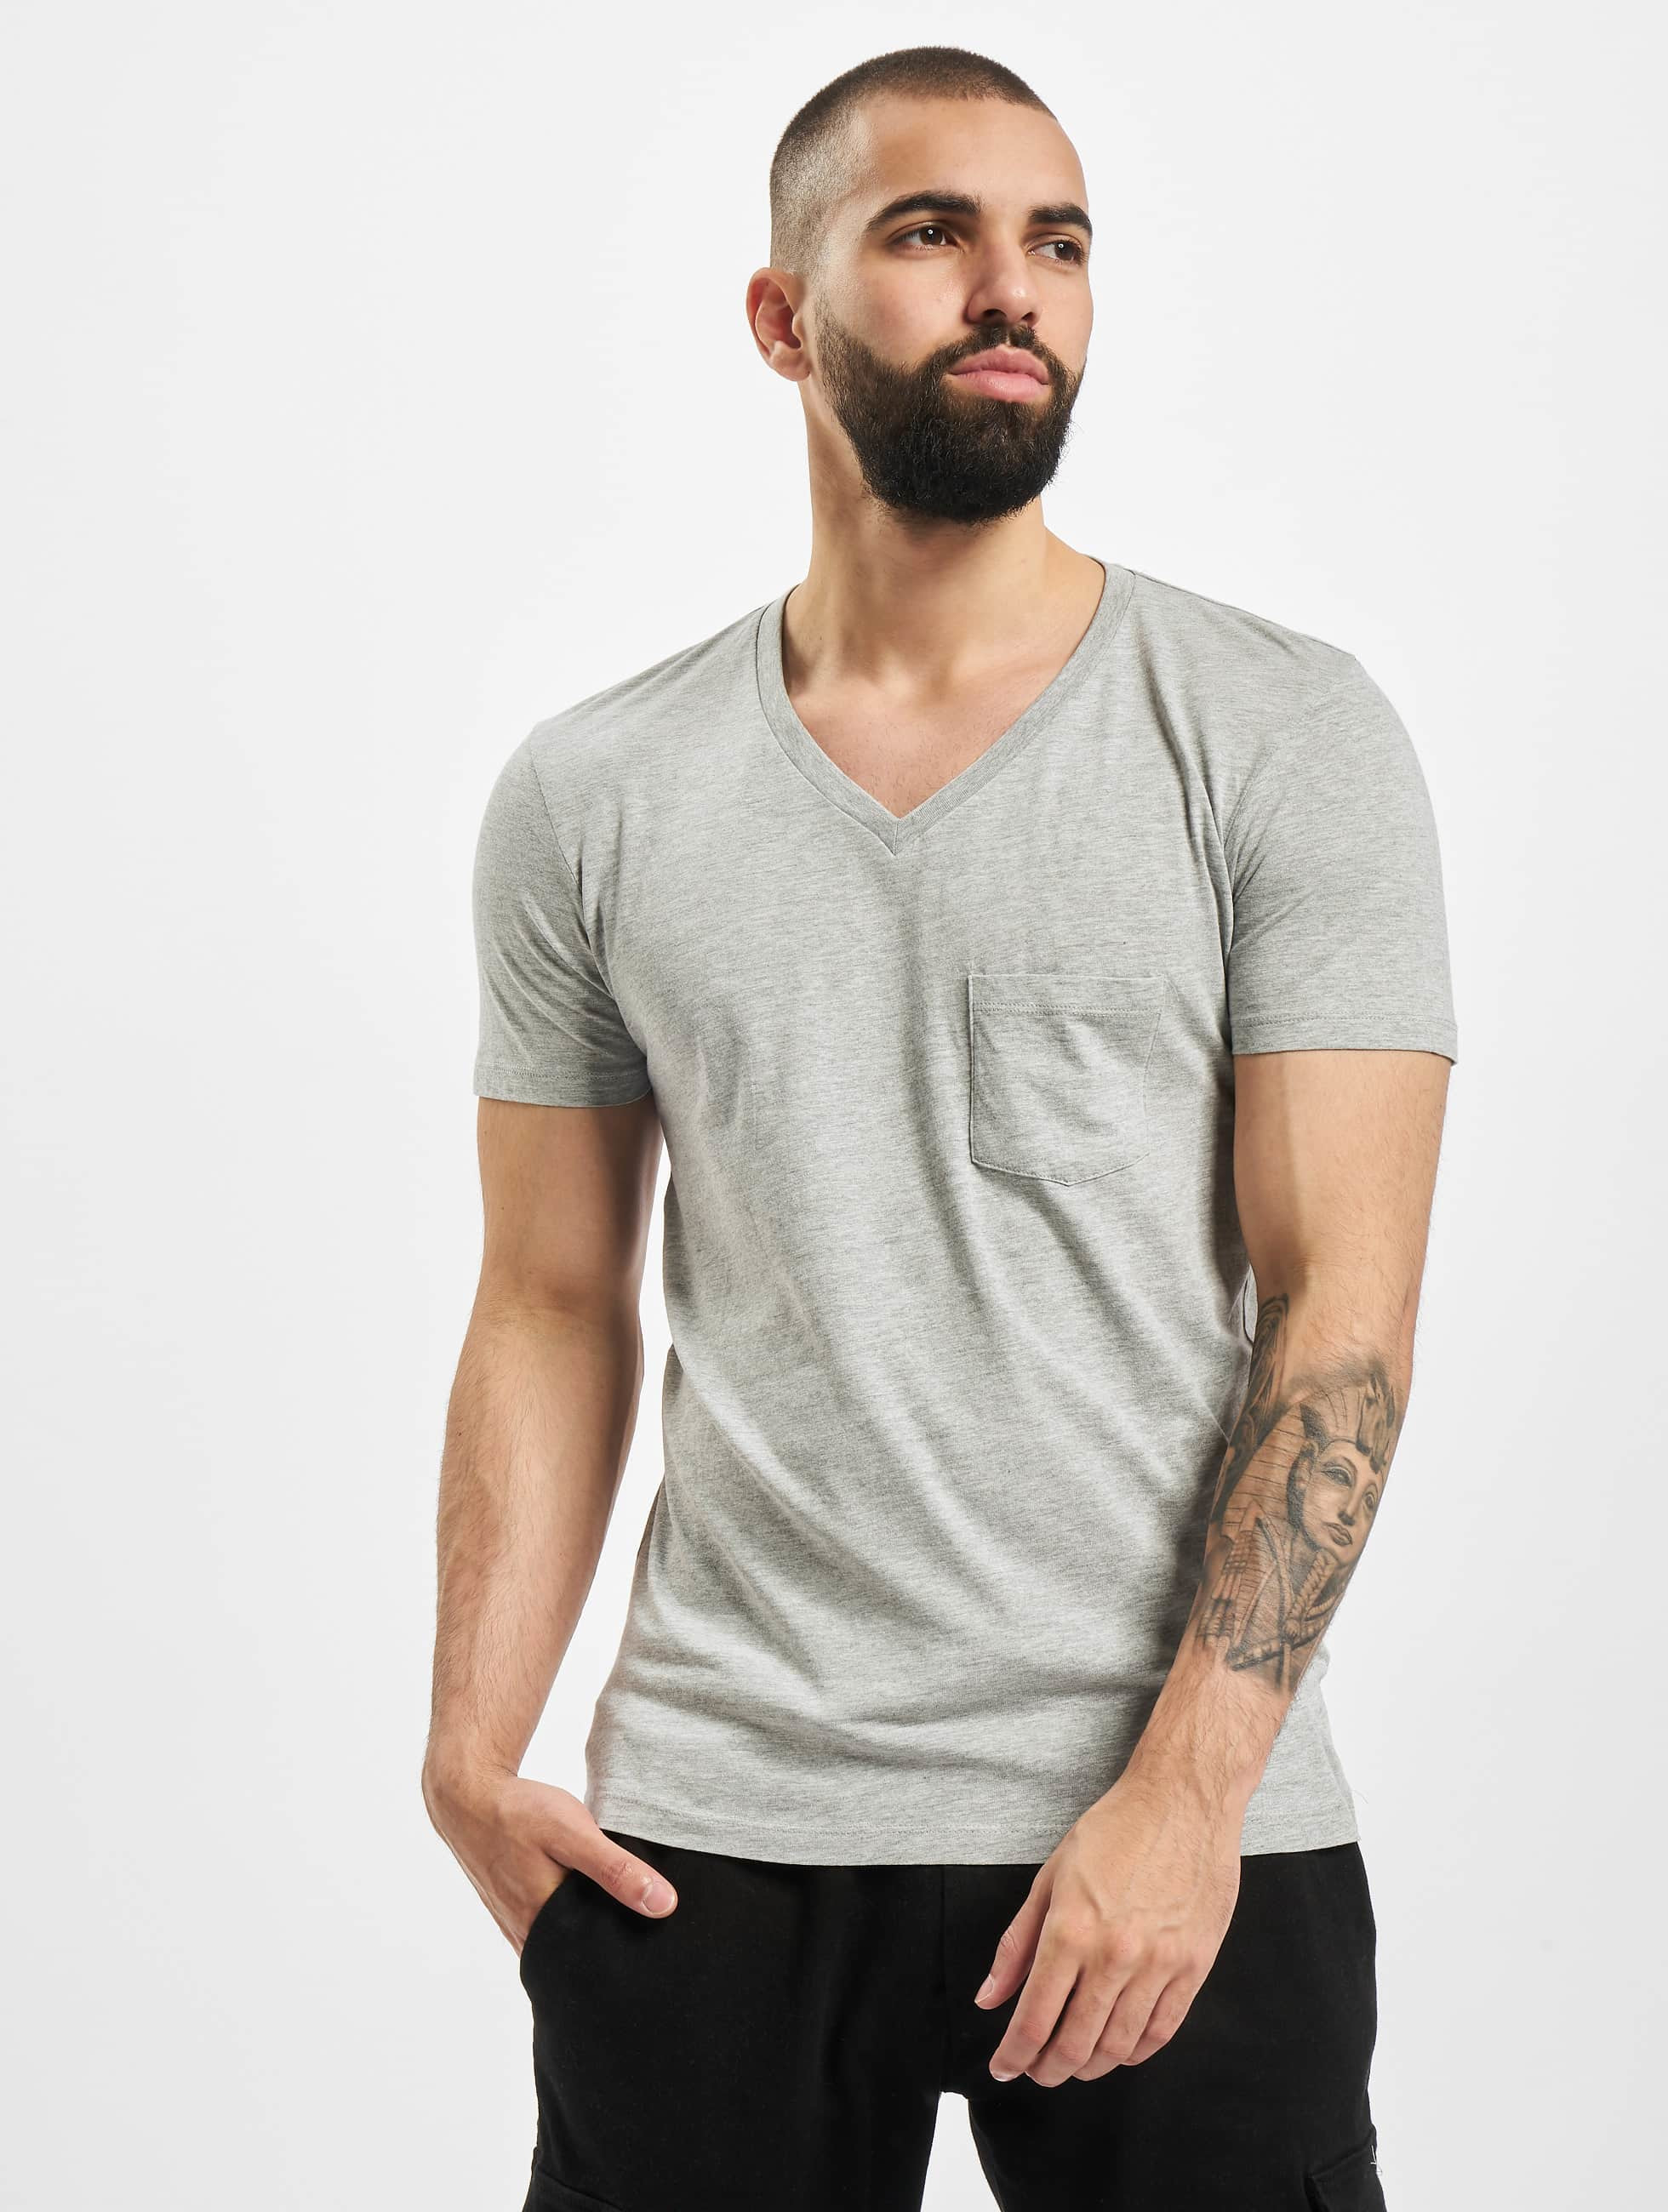 T-Shirt Pocket in grau